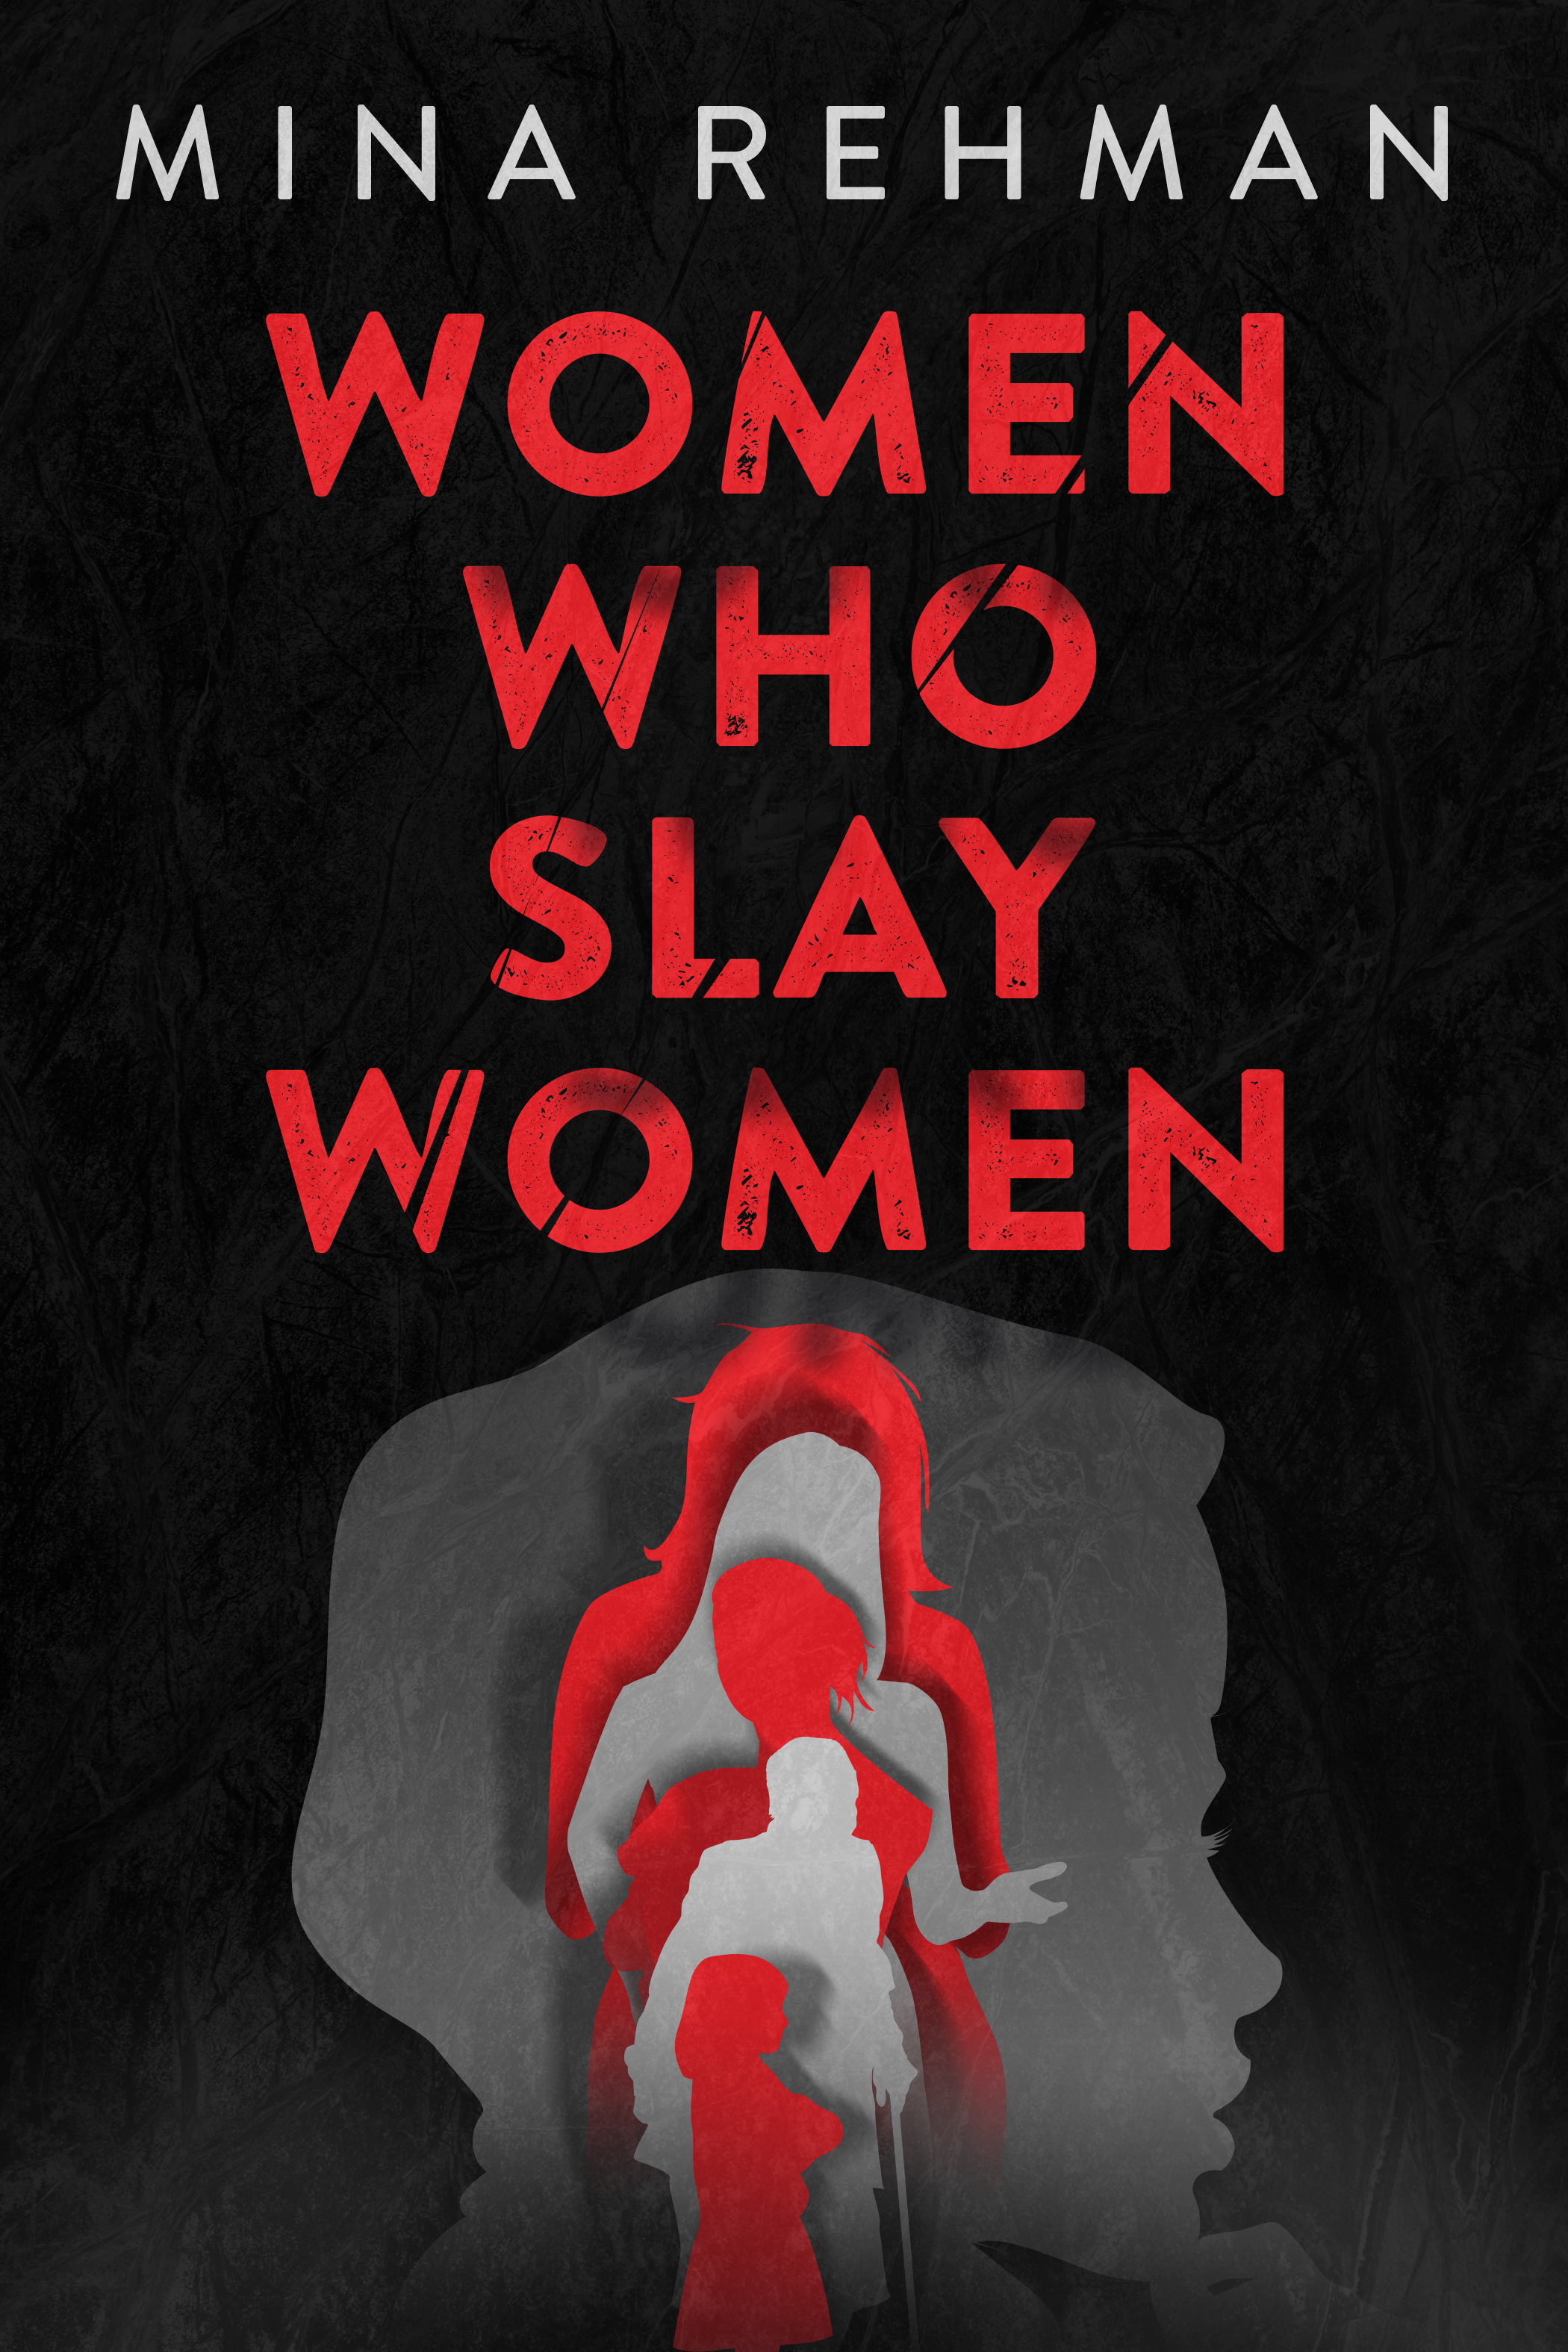 Women Who Slay Women by Mina Rehman